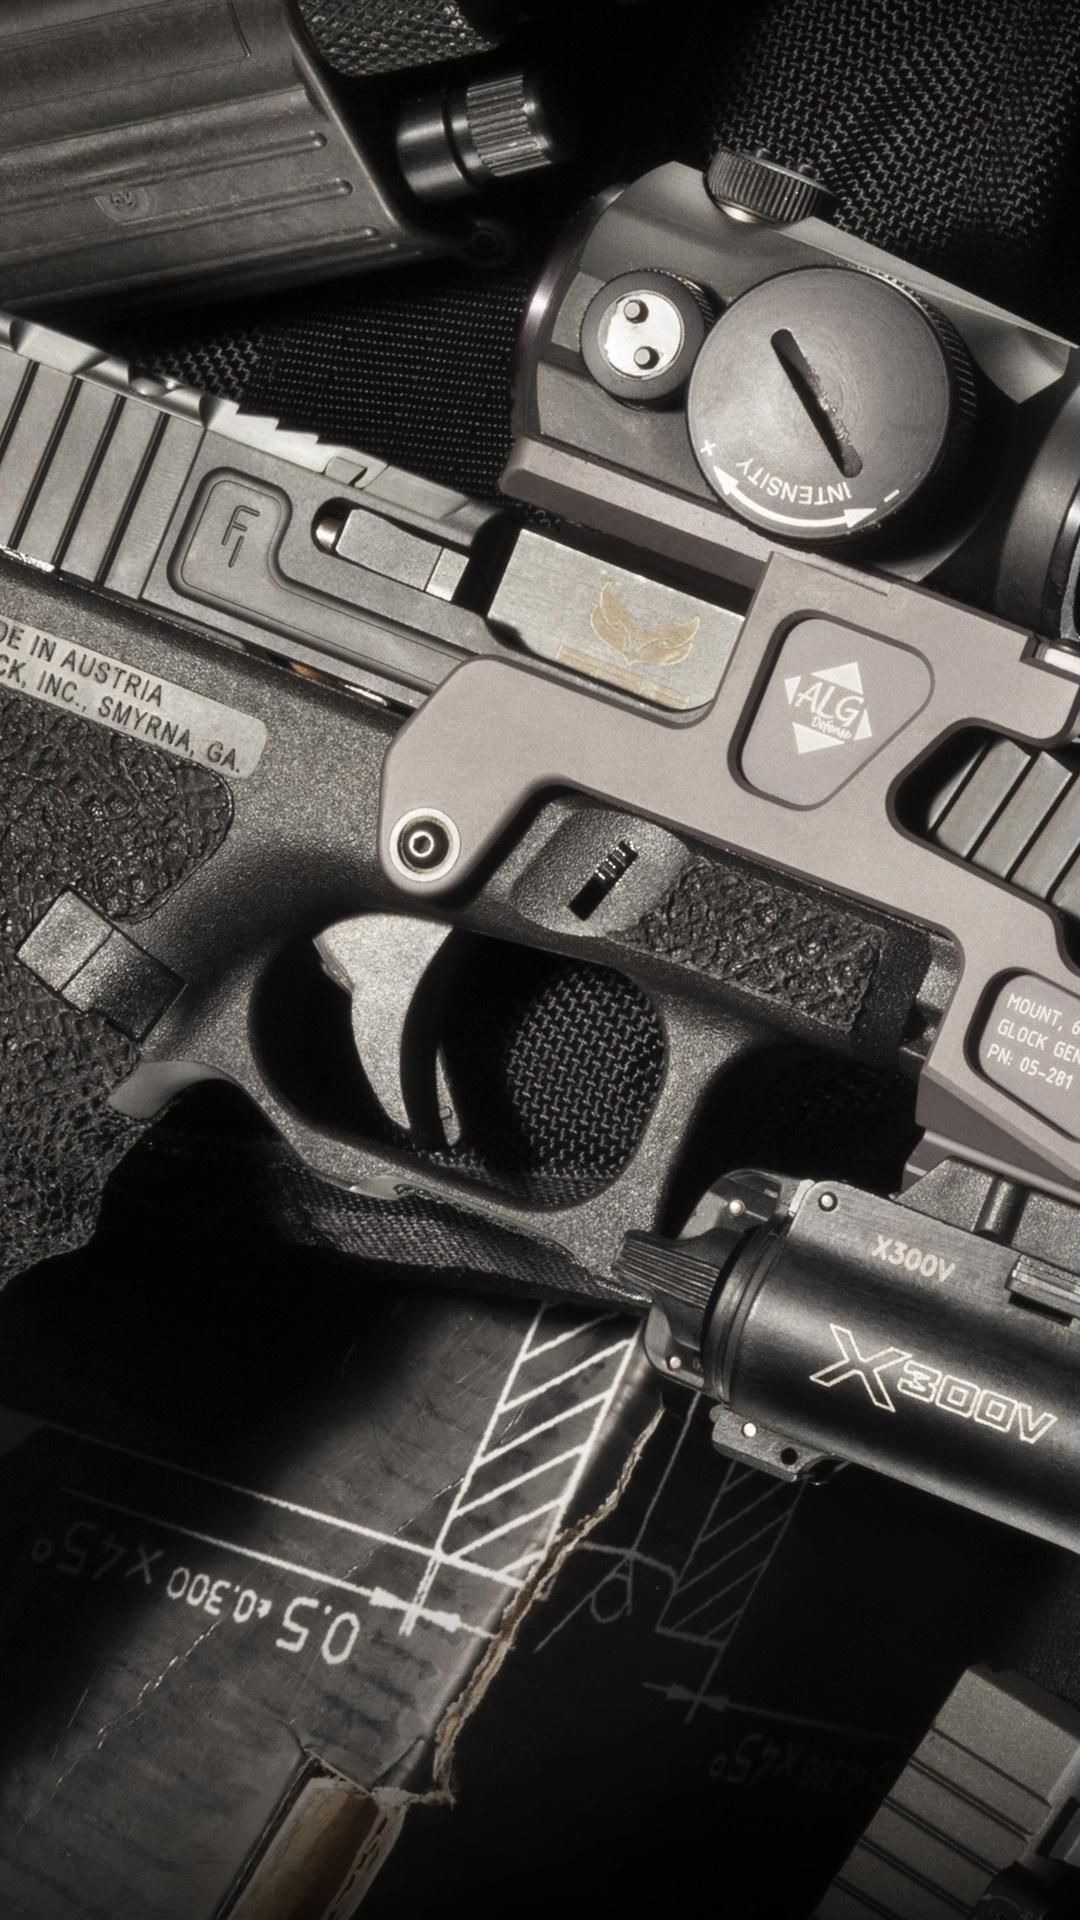 Glock 17 self-loading gun, weapon